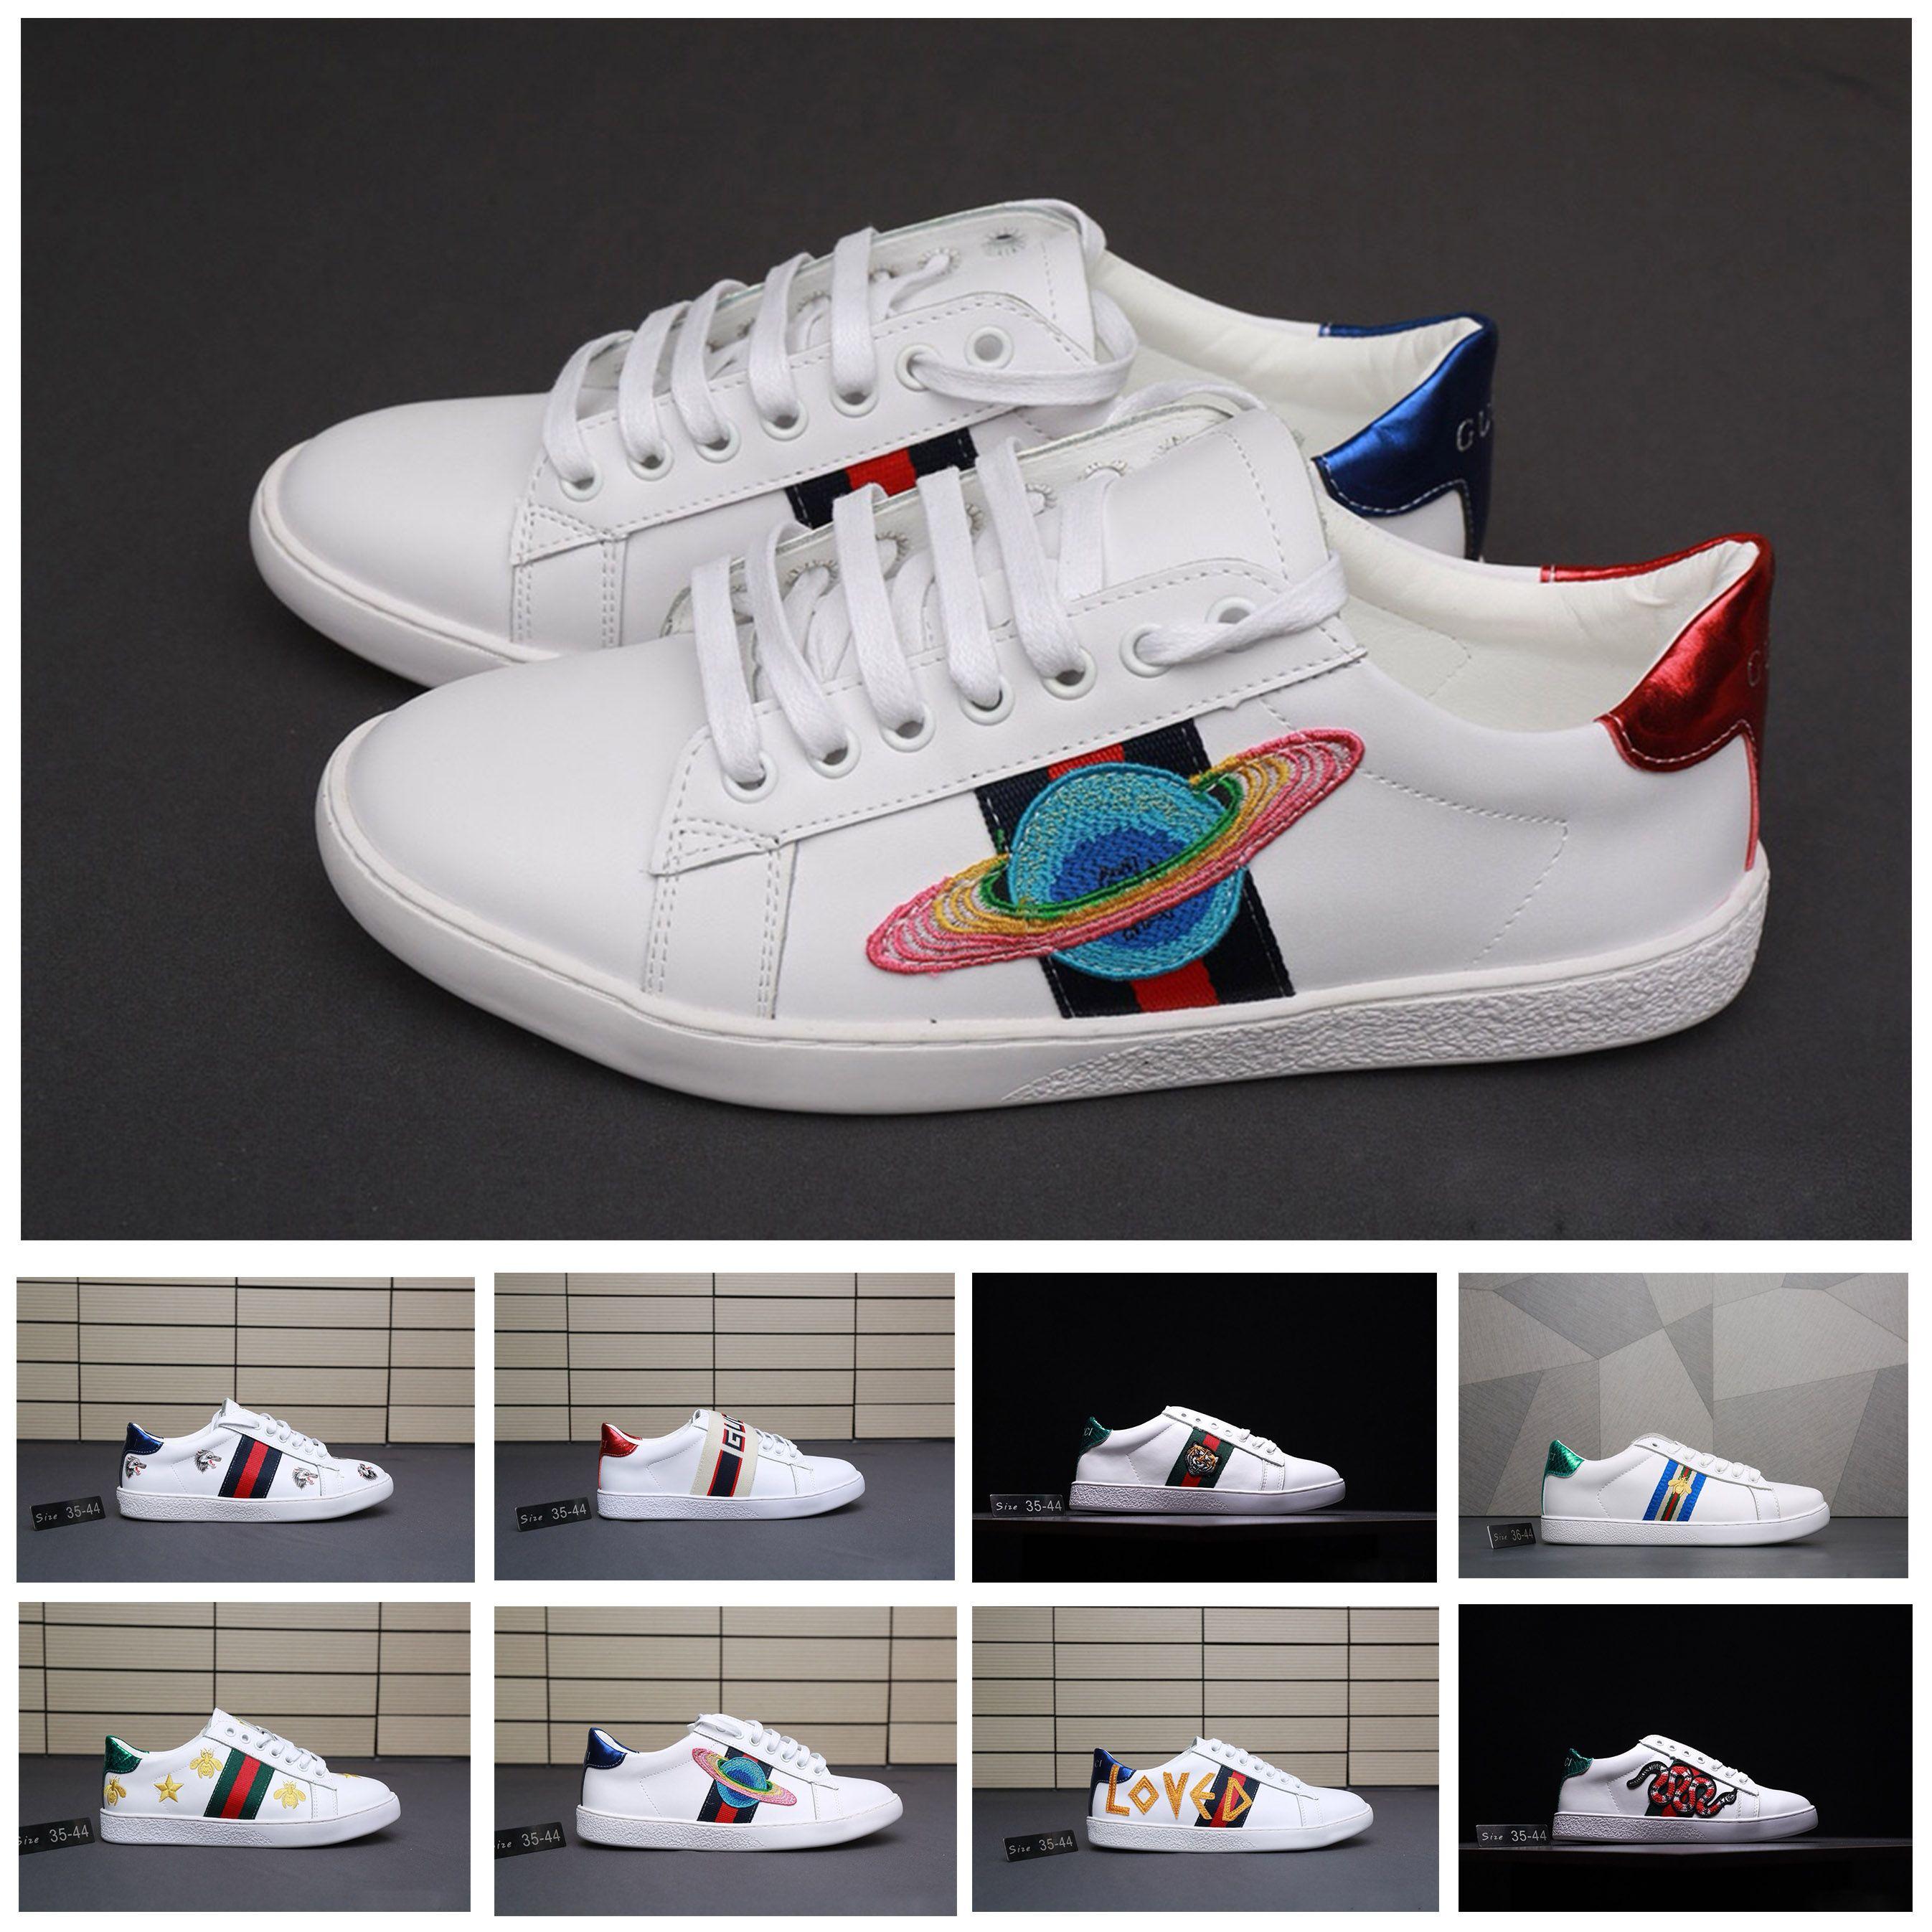 d368b62f4 Compre Gucci Men Shoes Gucci Shoes Women Gucci Sneakers Best Selling  Sneakers Bordados Tênis, Letras Bordadas, Cosmos, Tênis, Cabeça De Lobo,  Mens Sapatos ...